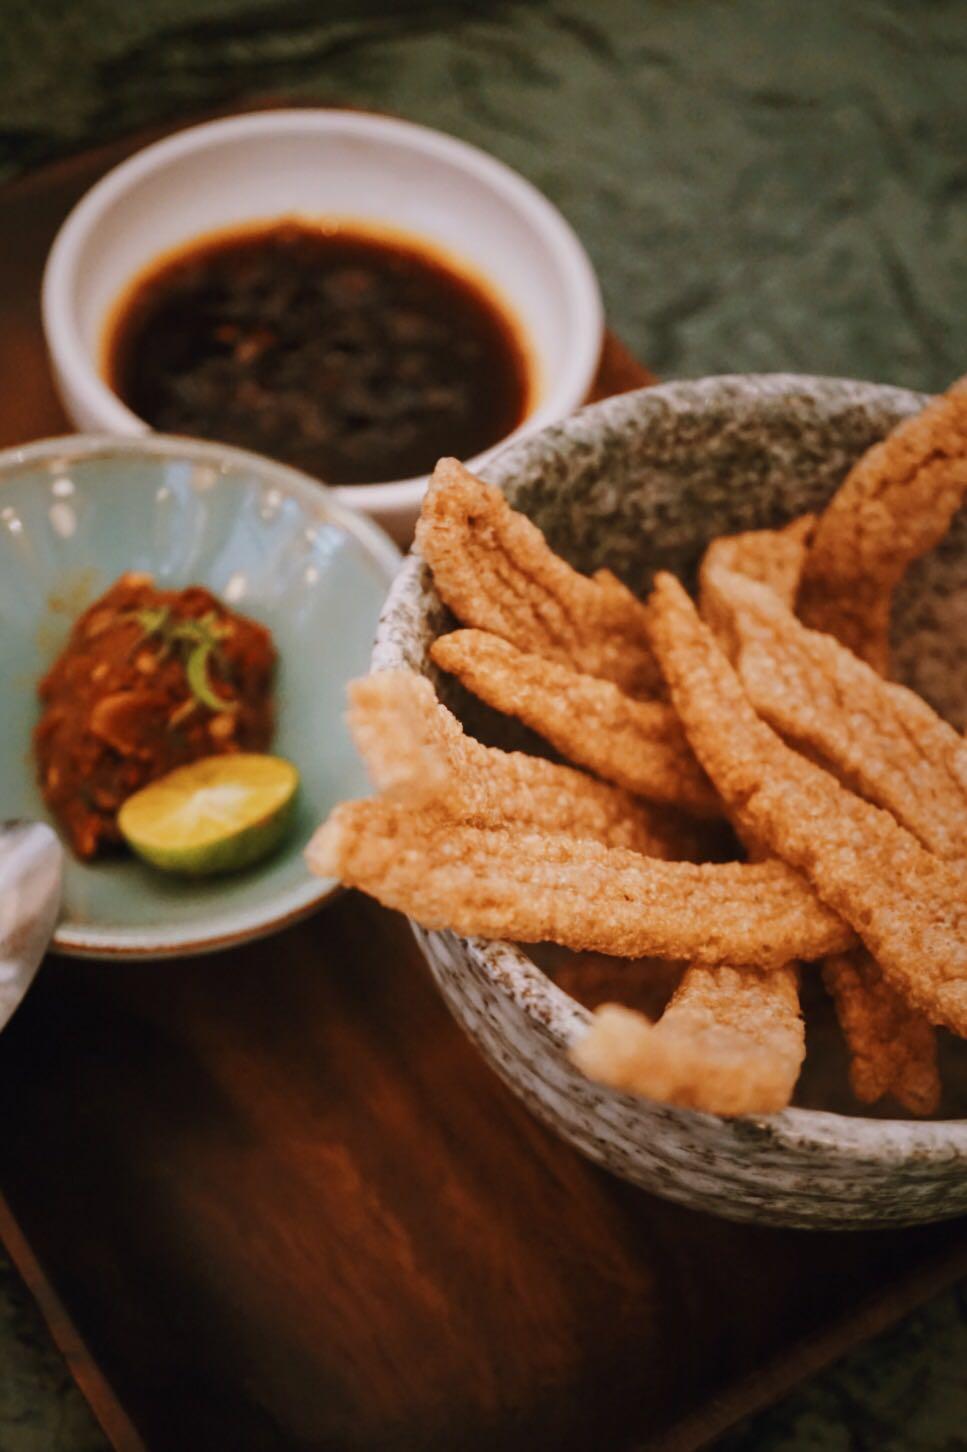 Belachan Candlenut Singapore Peranakan Restaurant